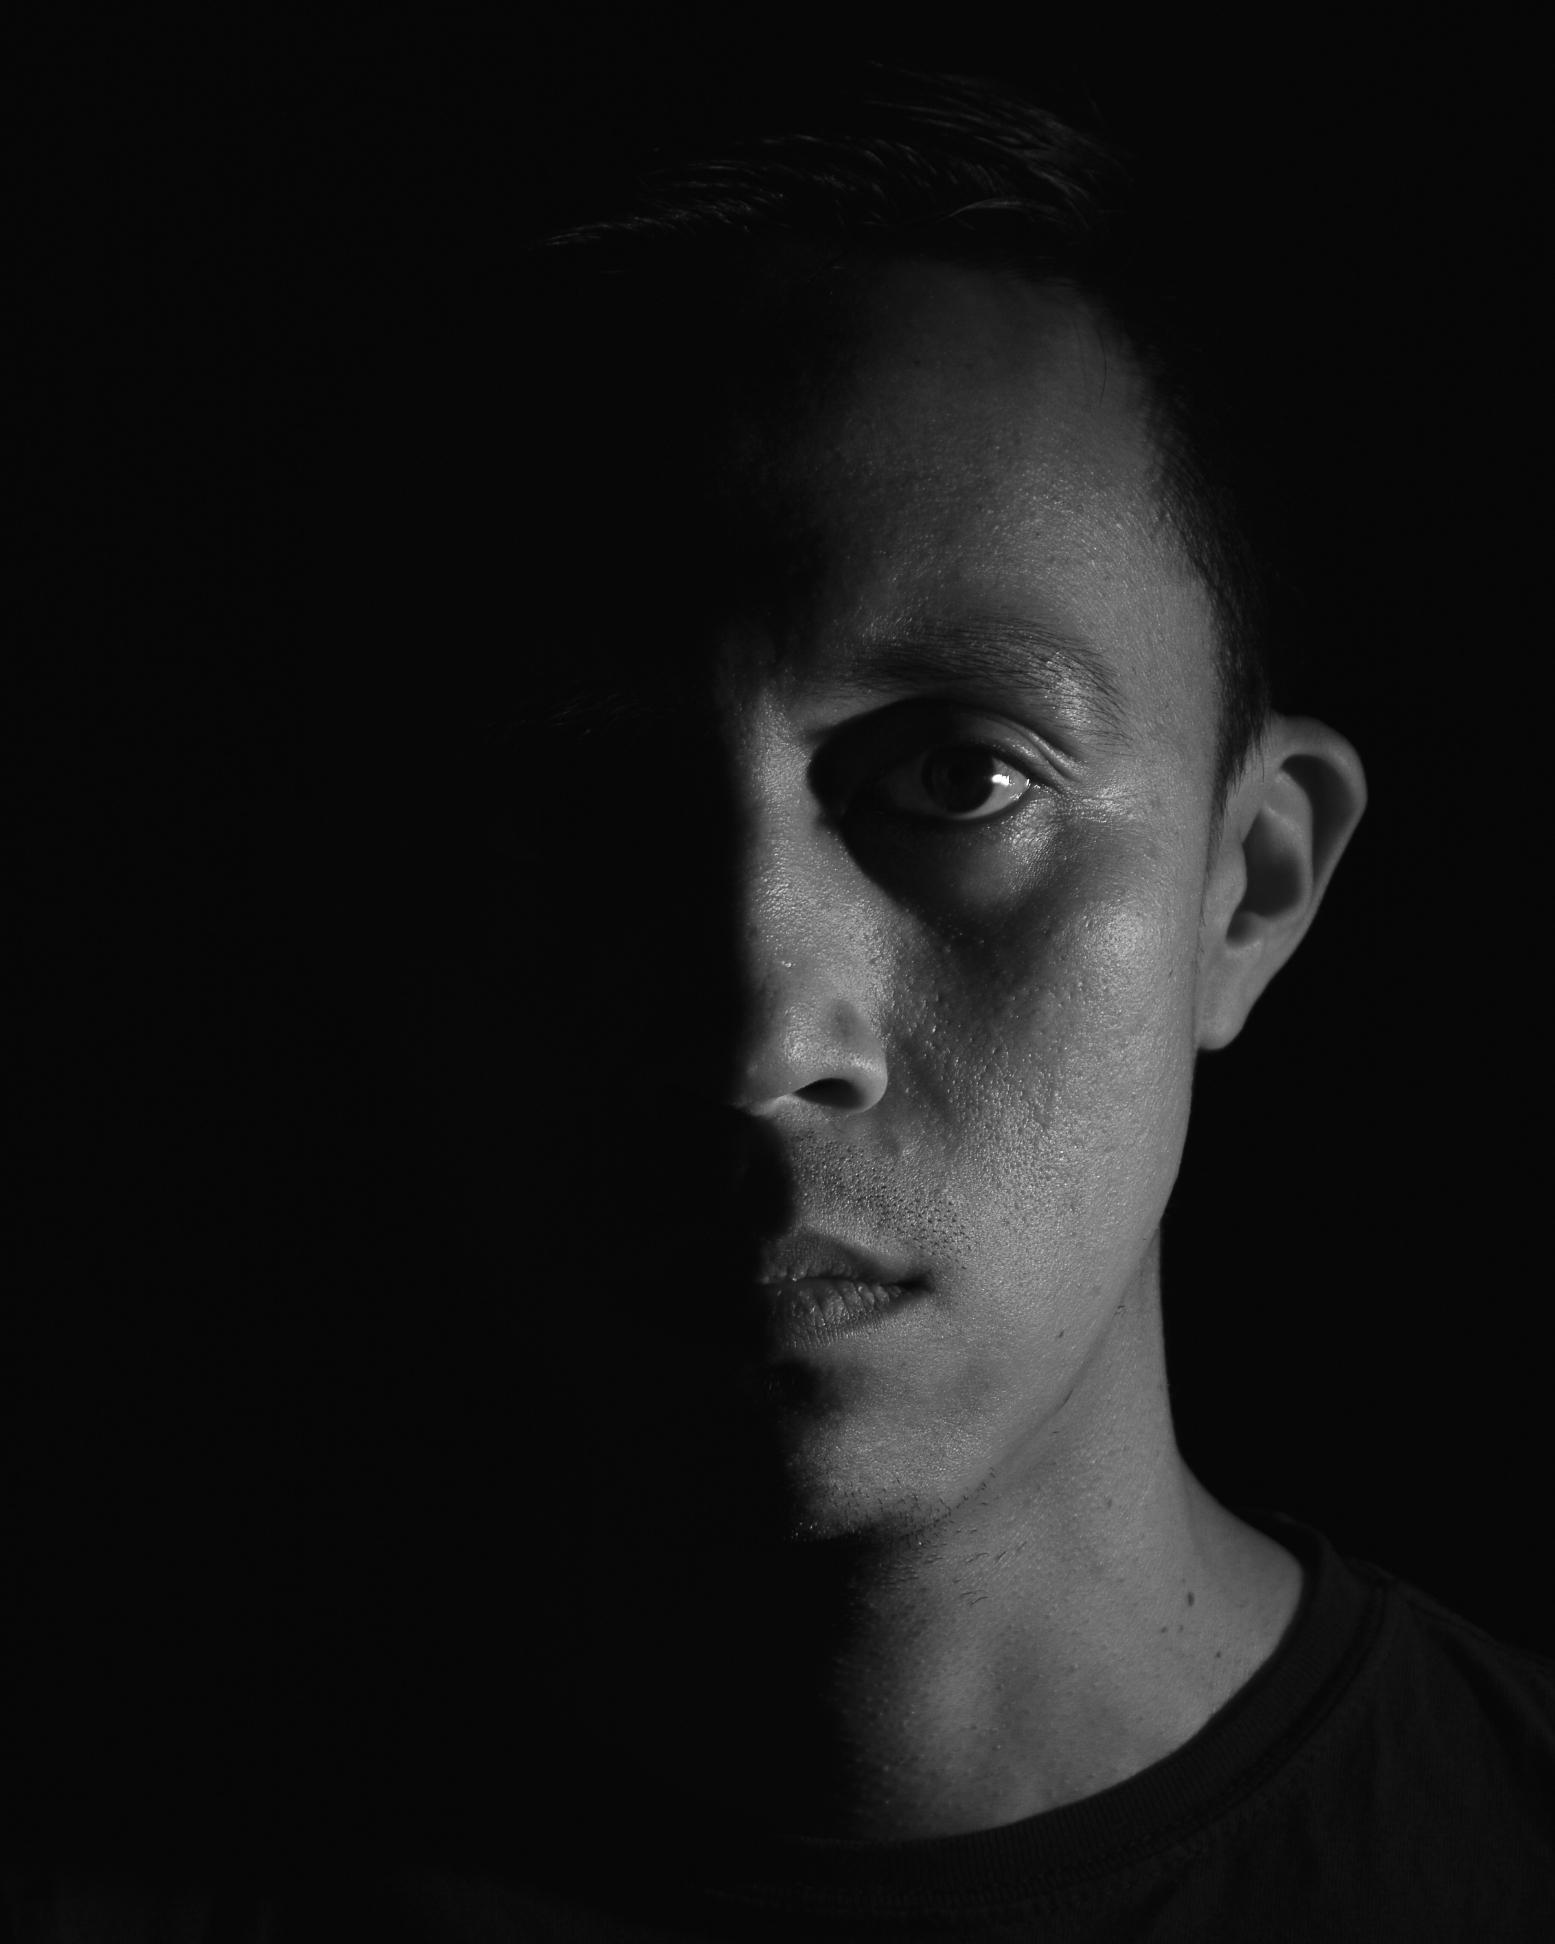 Aaron Kiʻilau